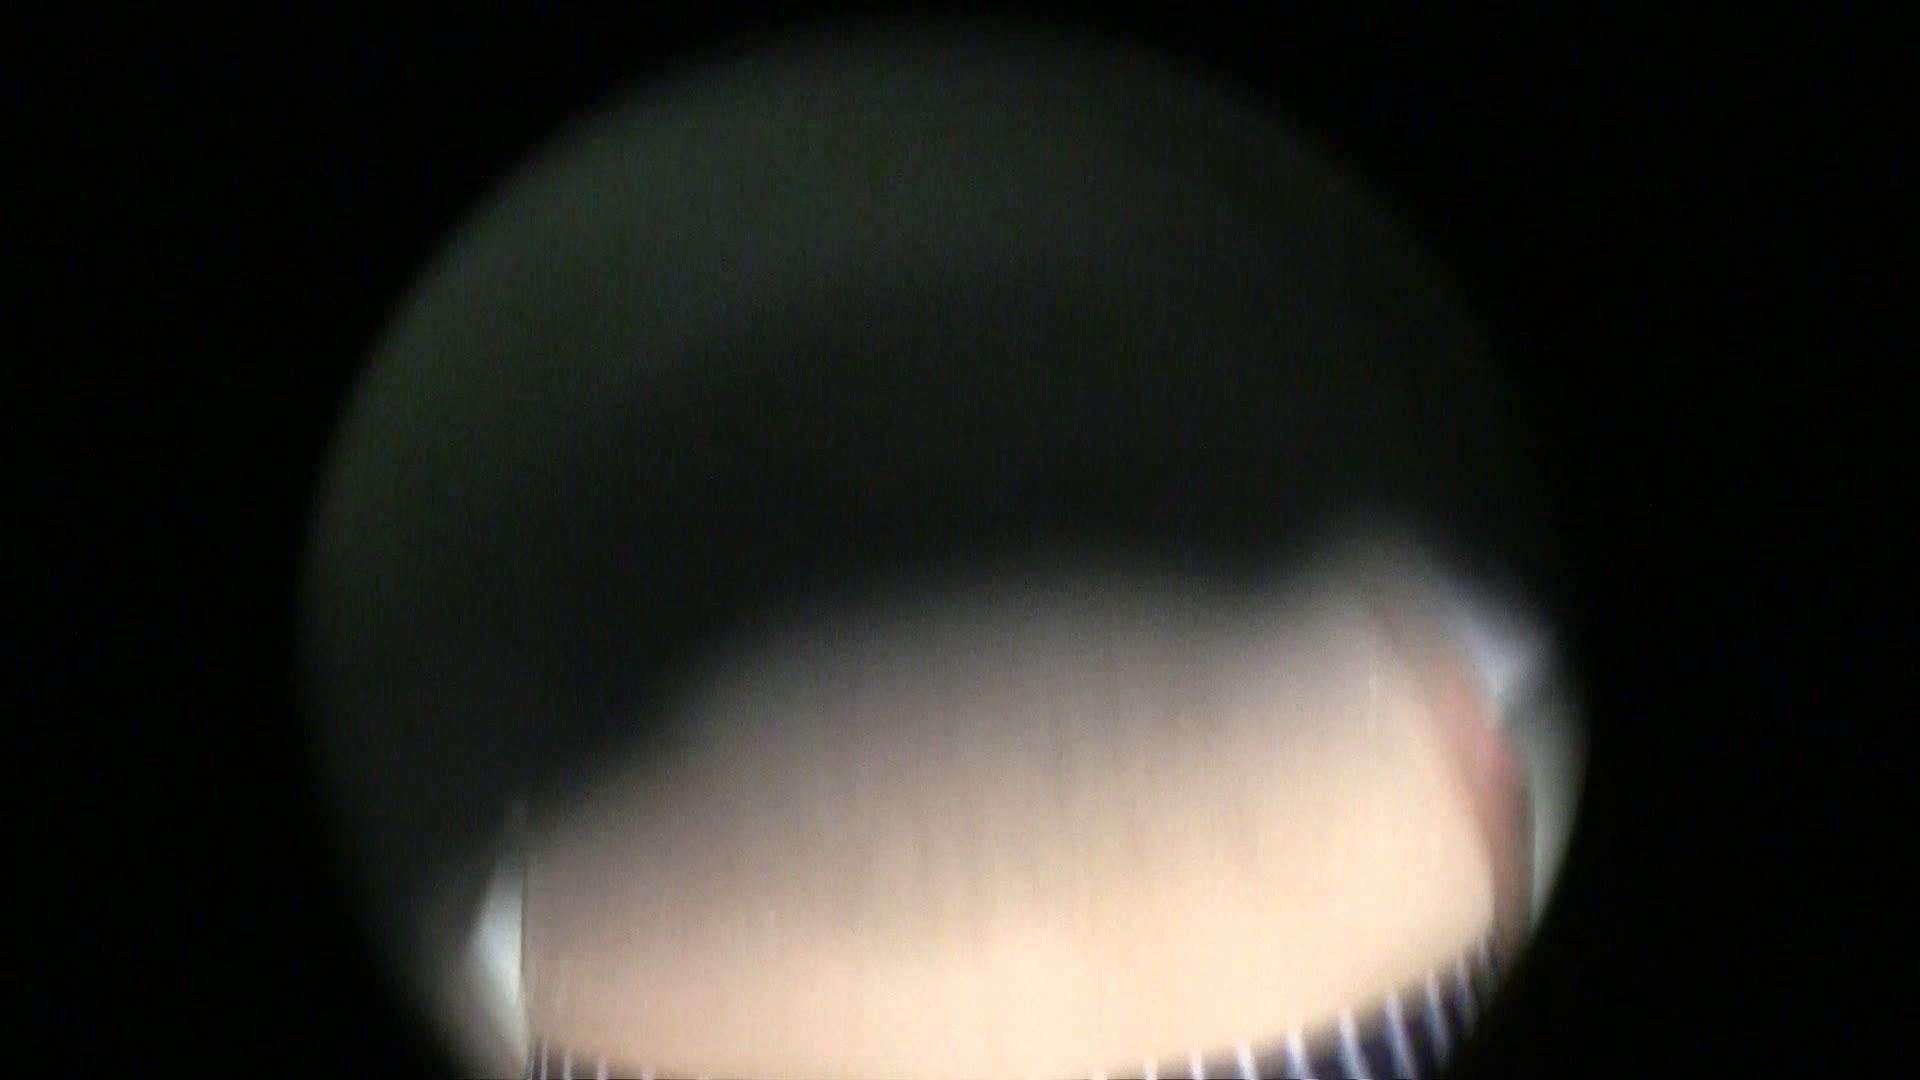 NO.43 乳首の先がチラ 背中でイメージして下さい シャワー 濡れ場動画紹介 99pic 52